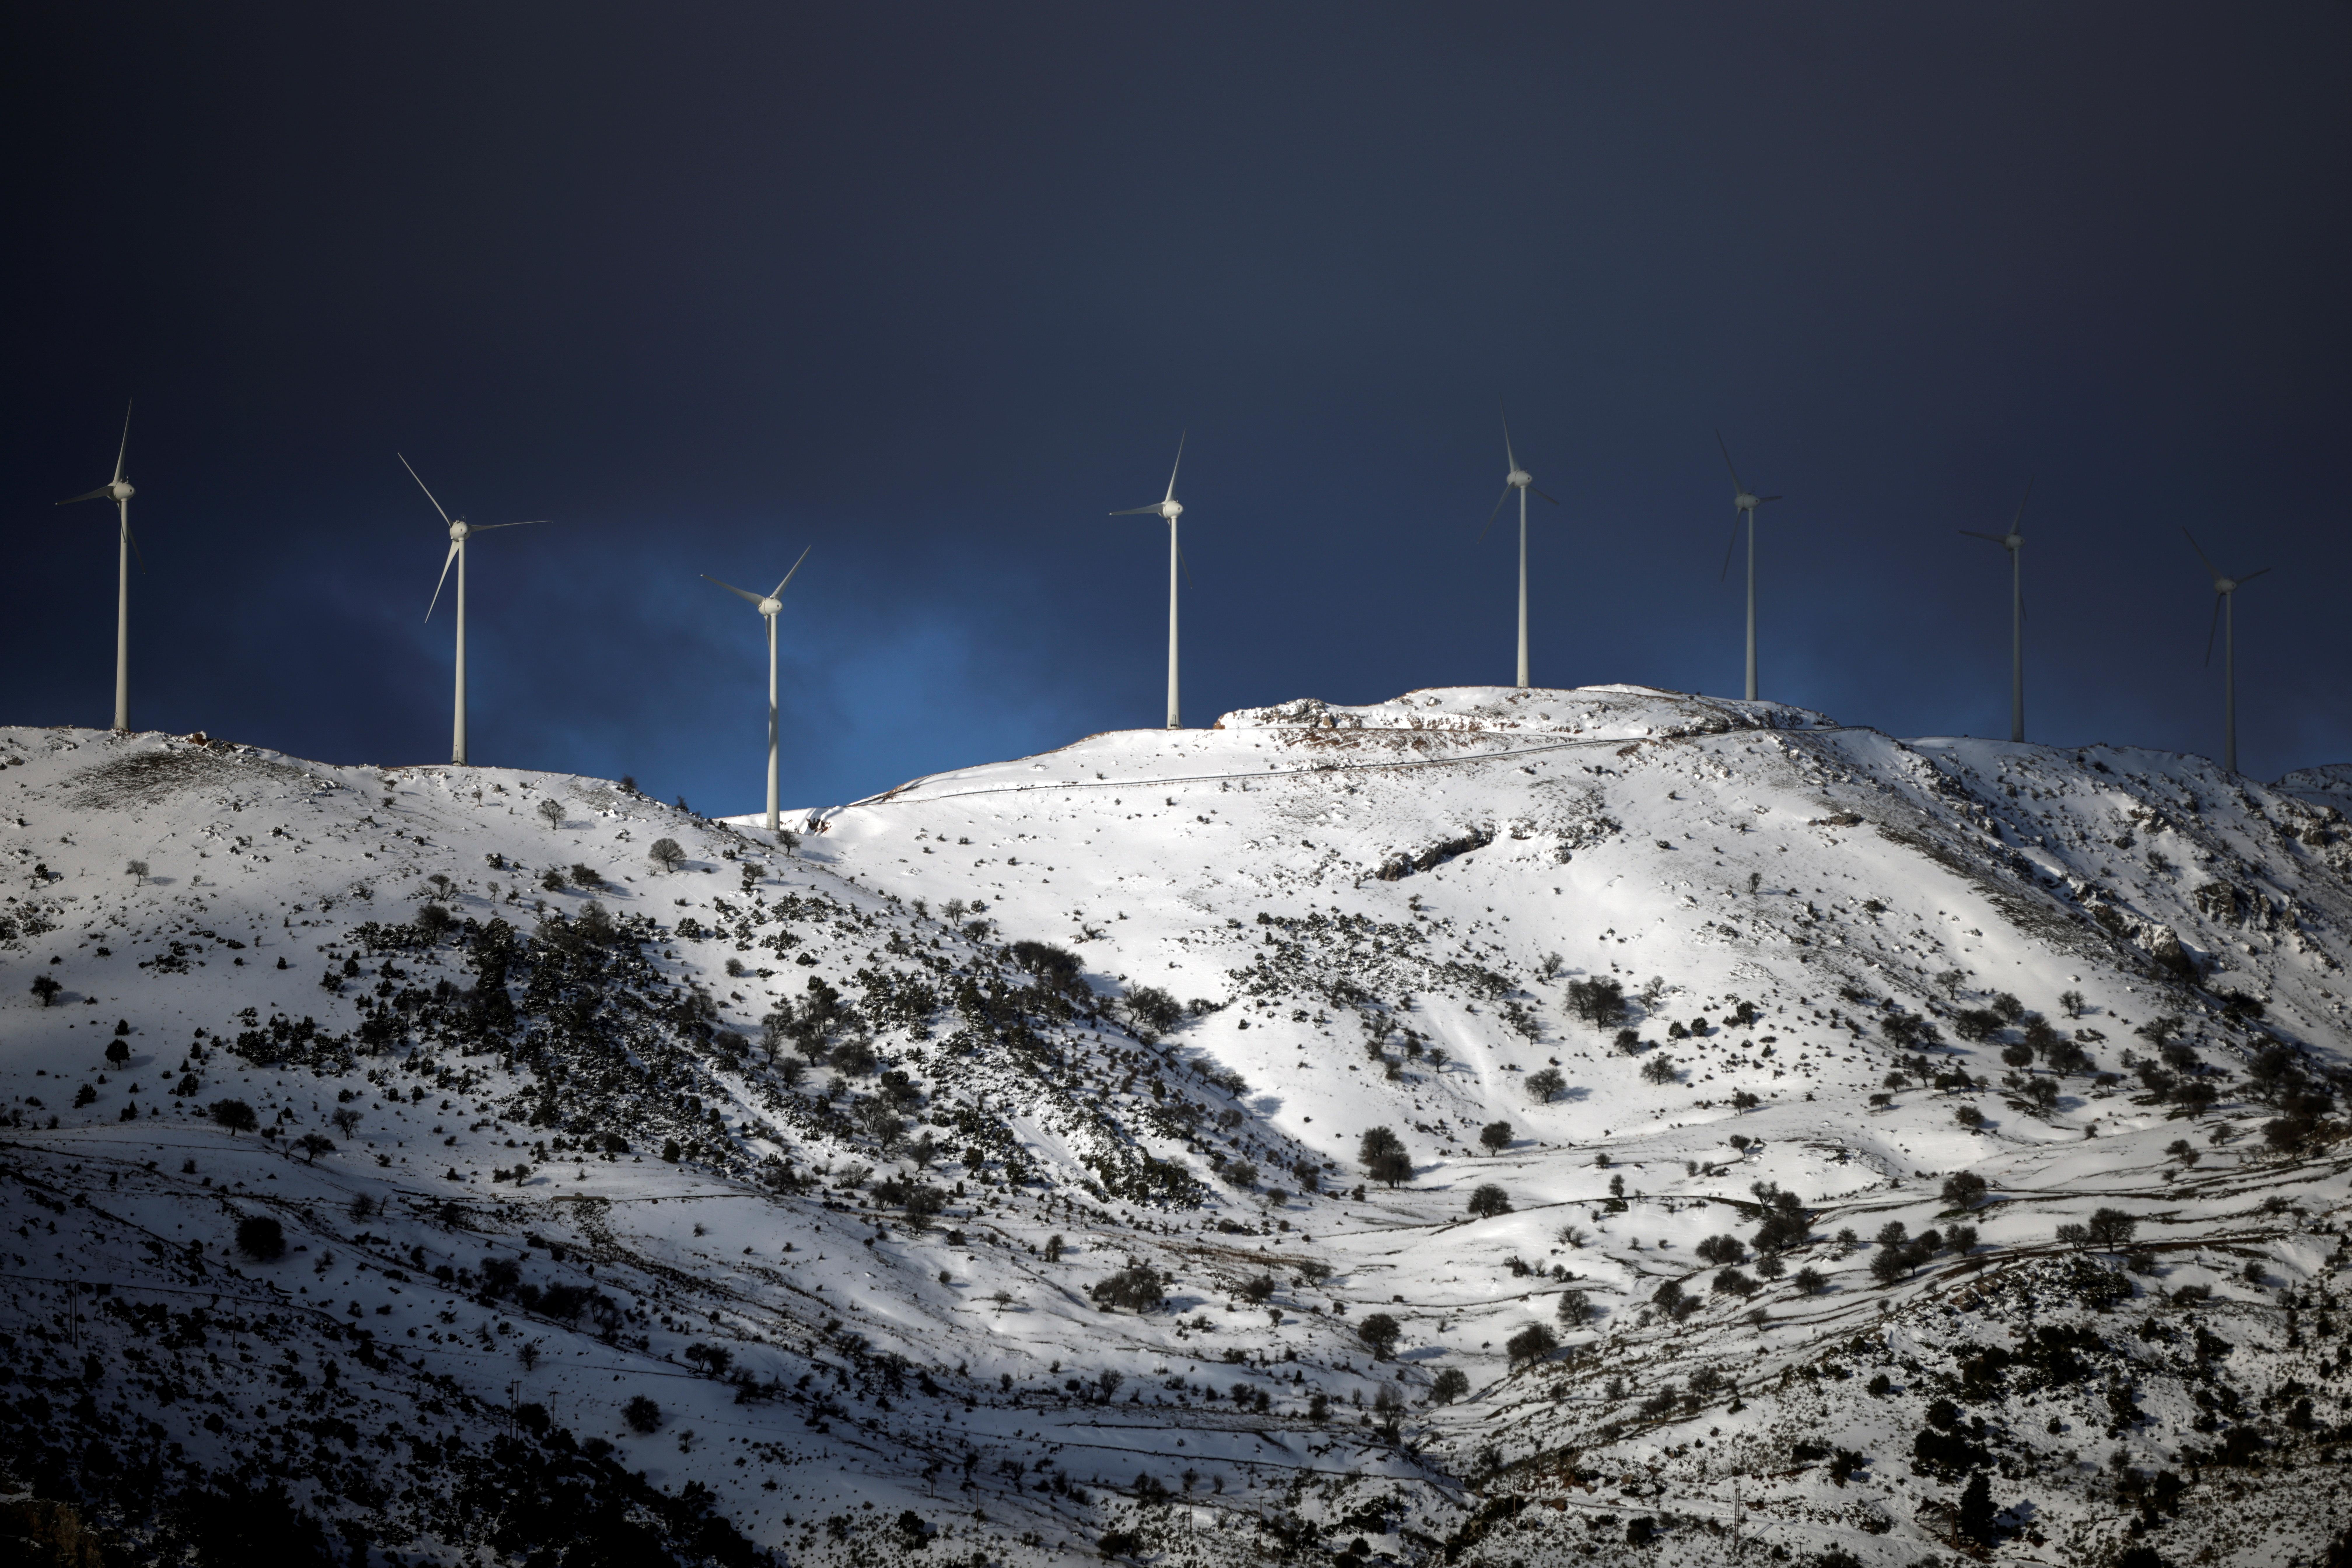 Wind turbines operate on a snowy mountain near the town of Kalavrita, Greece, March 17, 2021. REUTERS/Alkis Konstantinidis